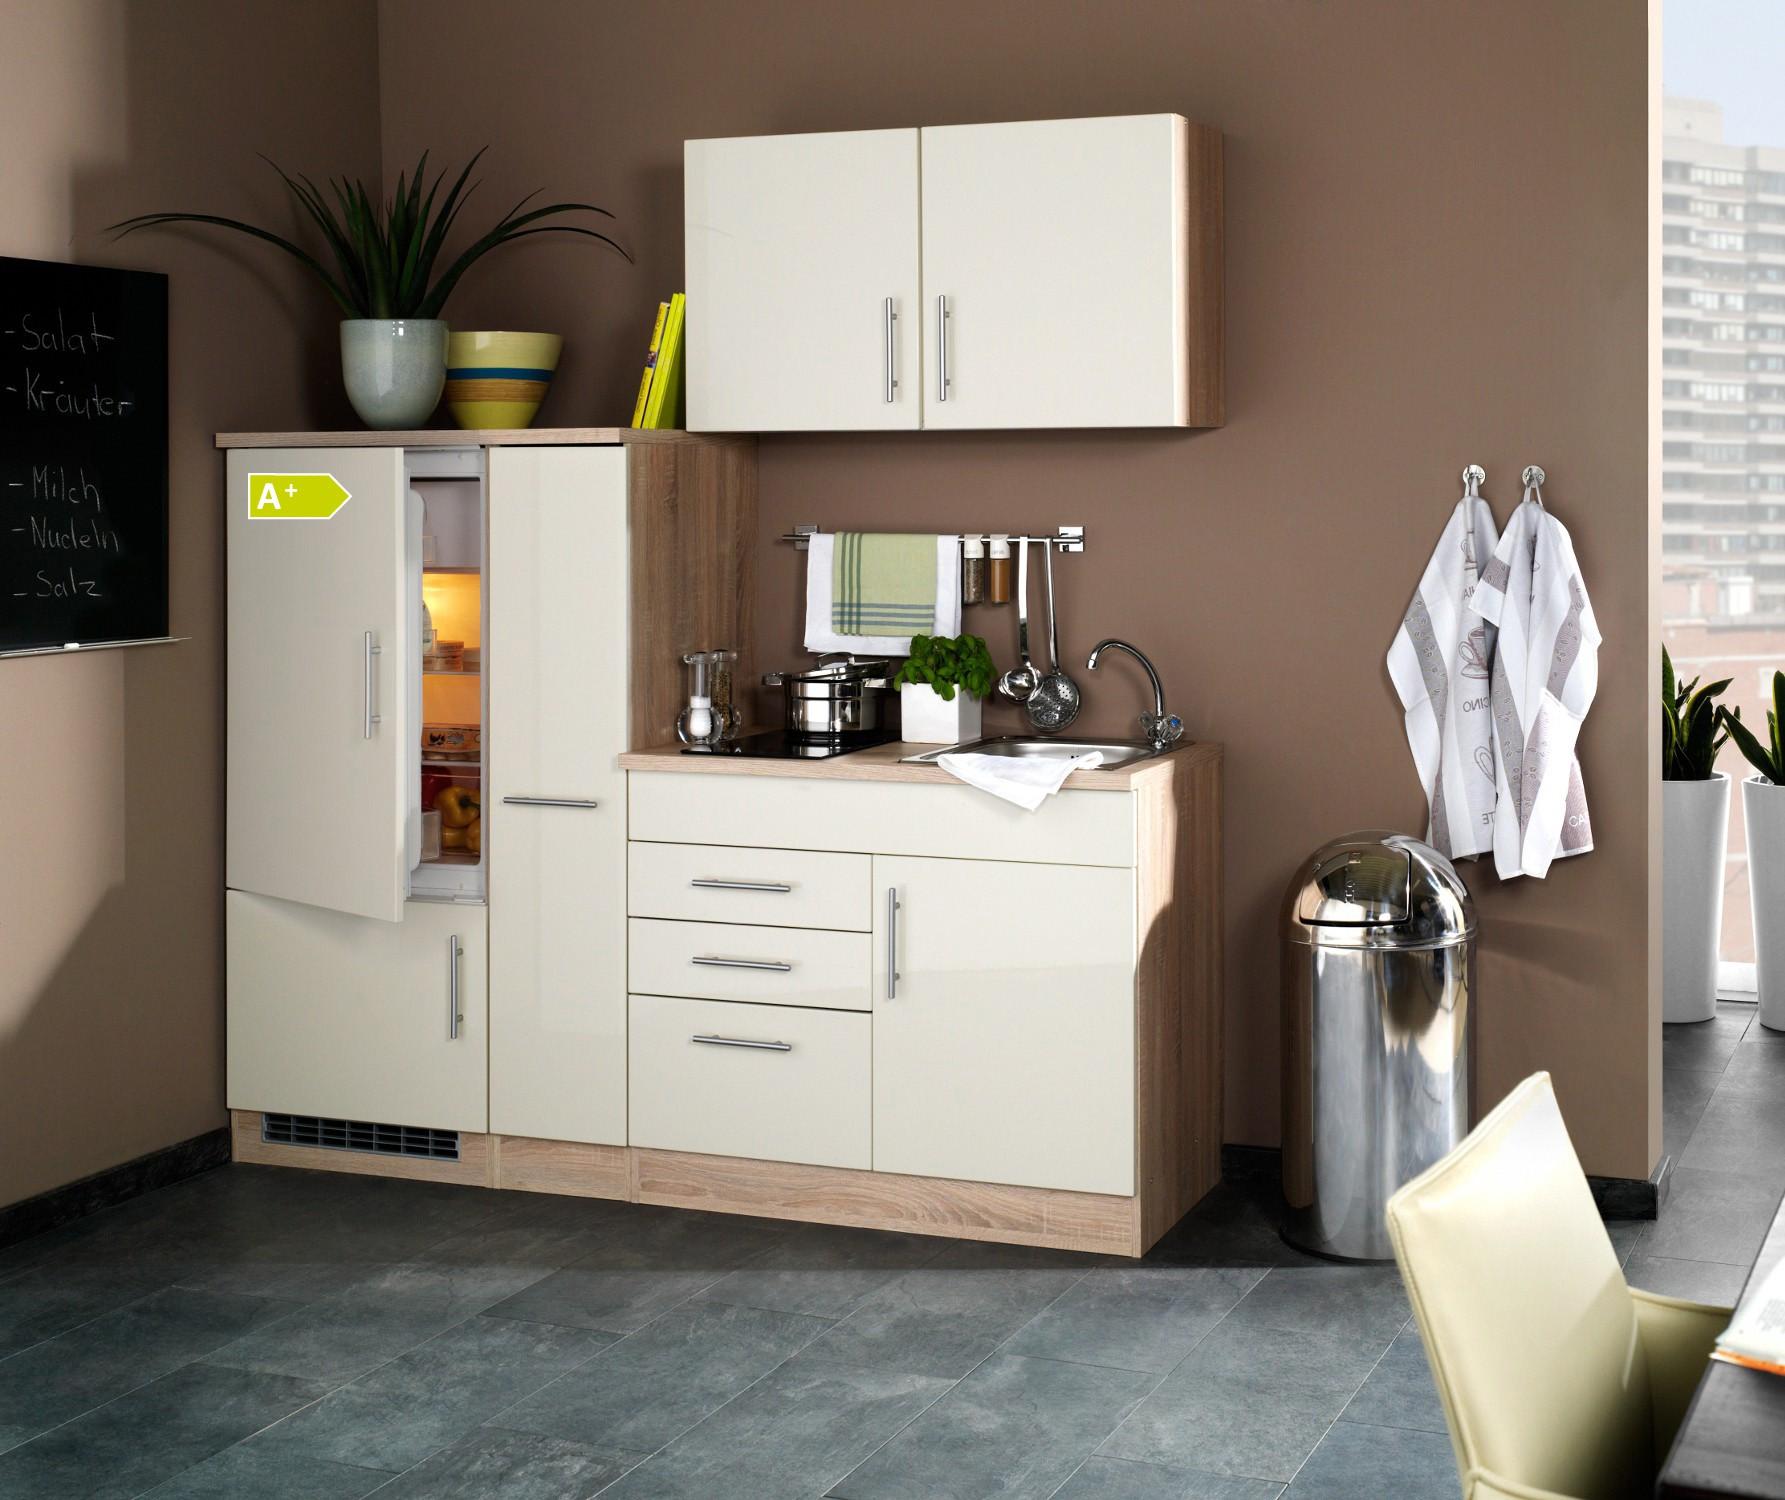 singlek che berlin glaskeramik kochfeld und k hlschrank. Black Bedroom Furniture Sets. Home Design Ideas